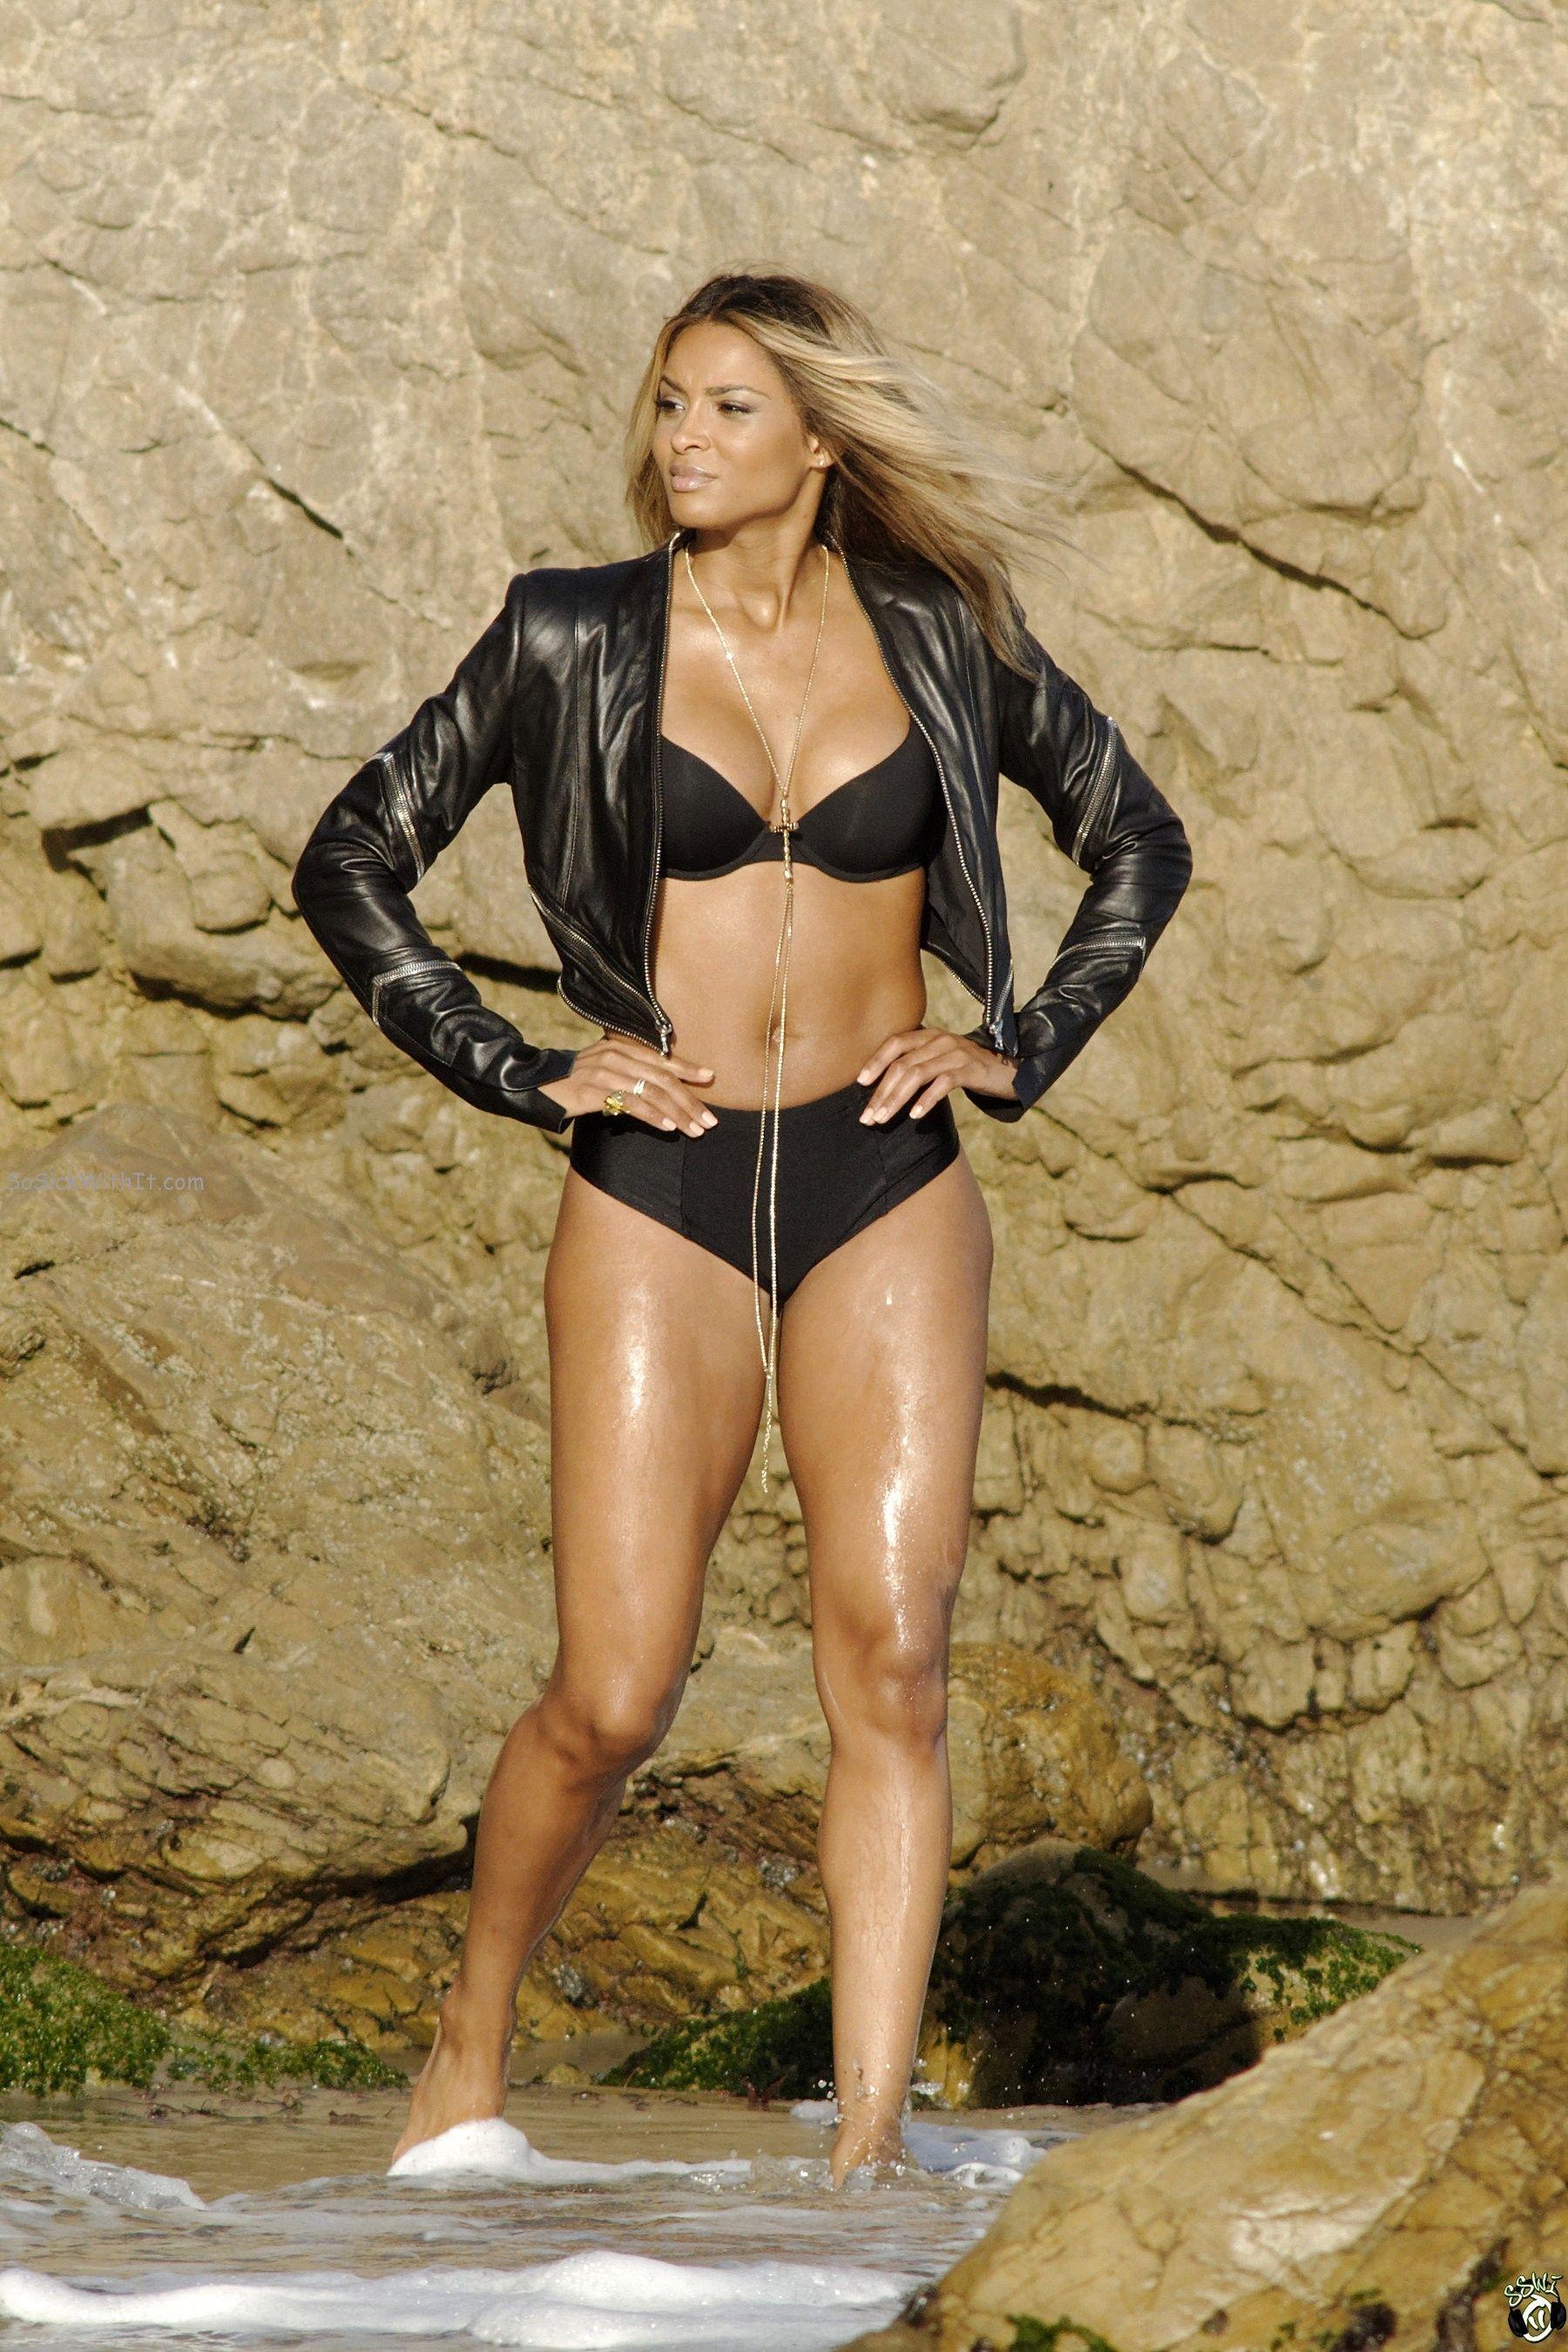 butt Singer ciara bikini